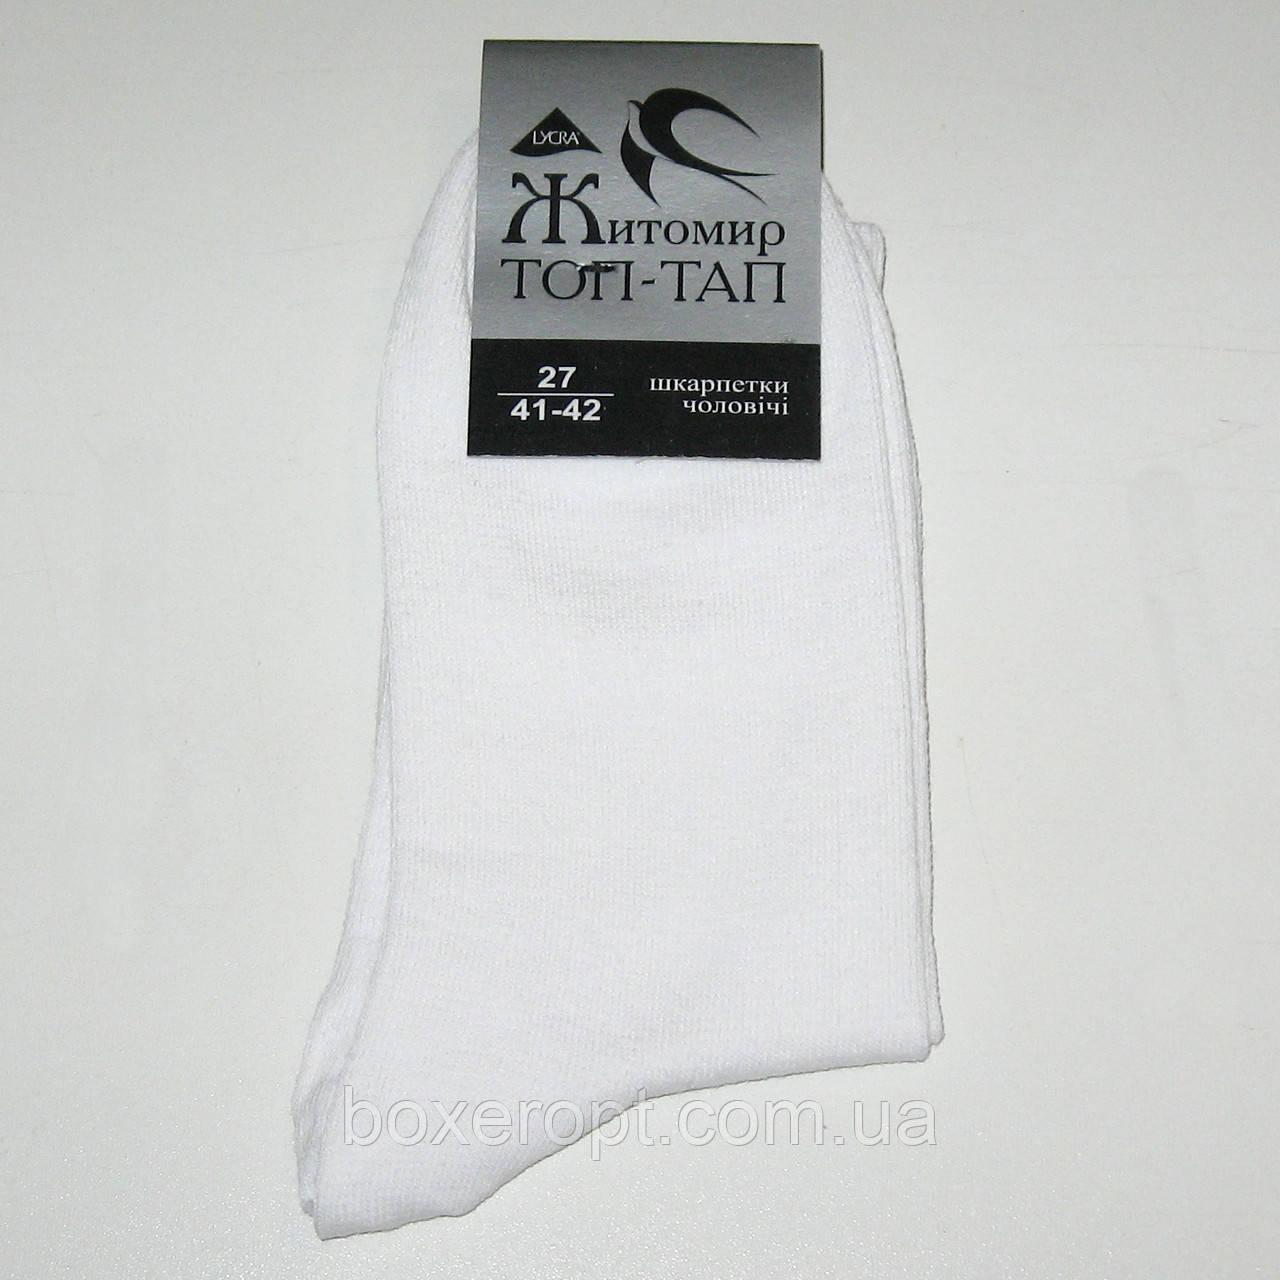 Мужские носки ТОП-ТАП - 7.00 грн./пара (стрейч, белые)